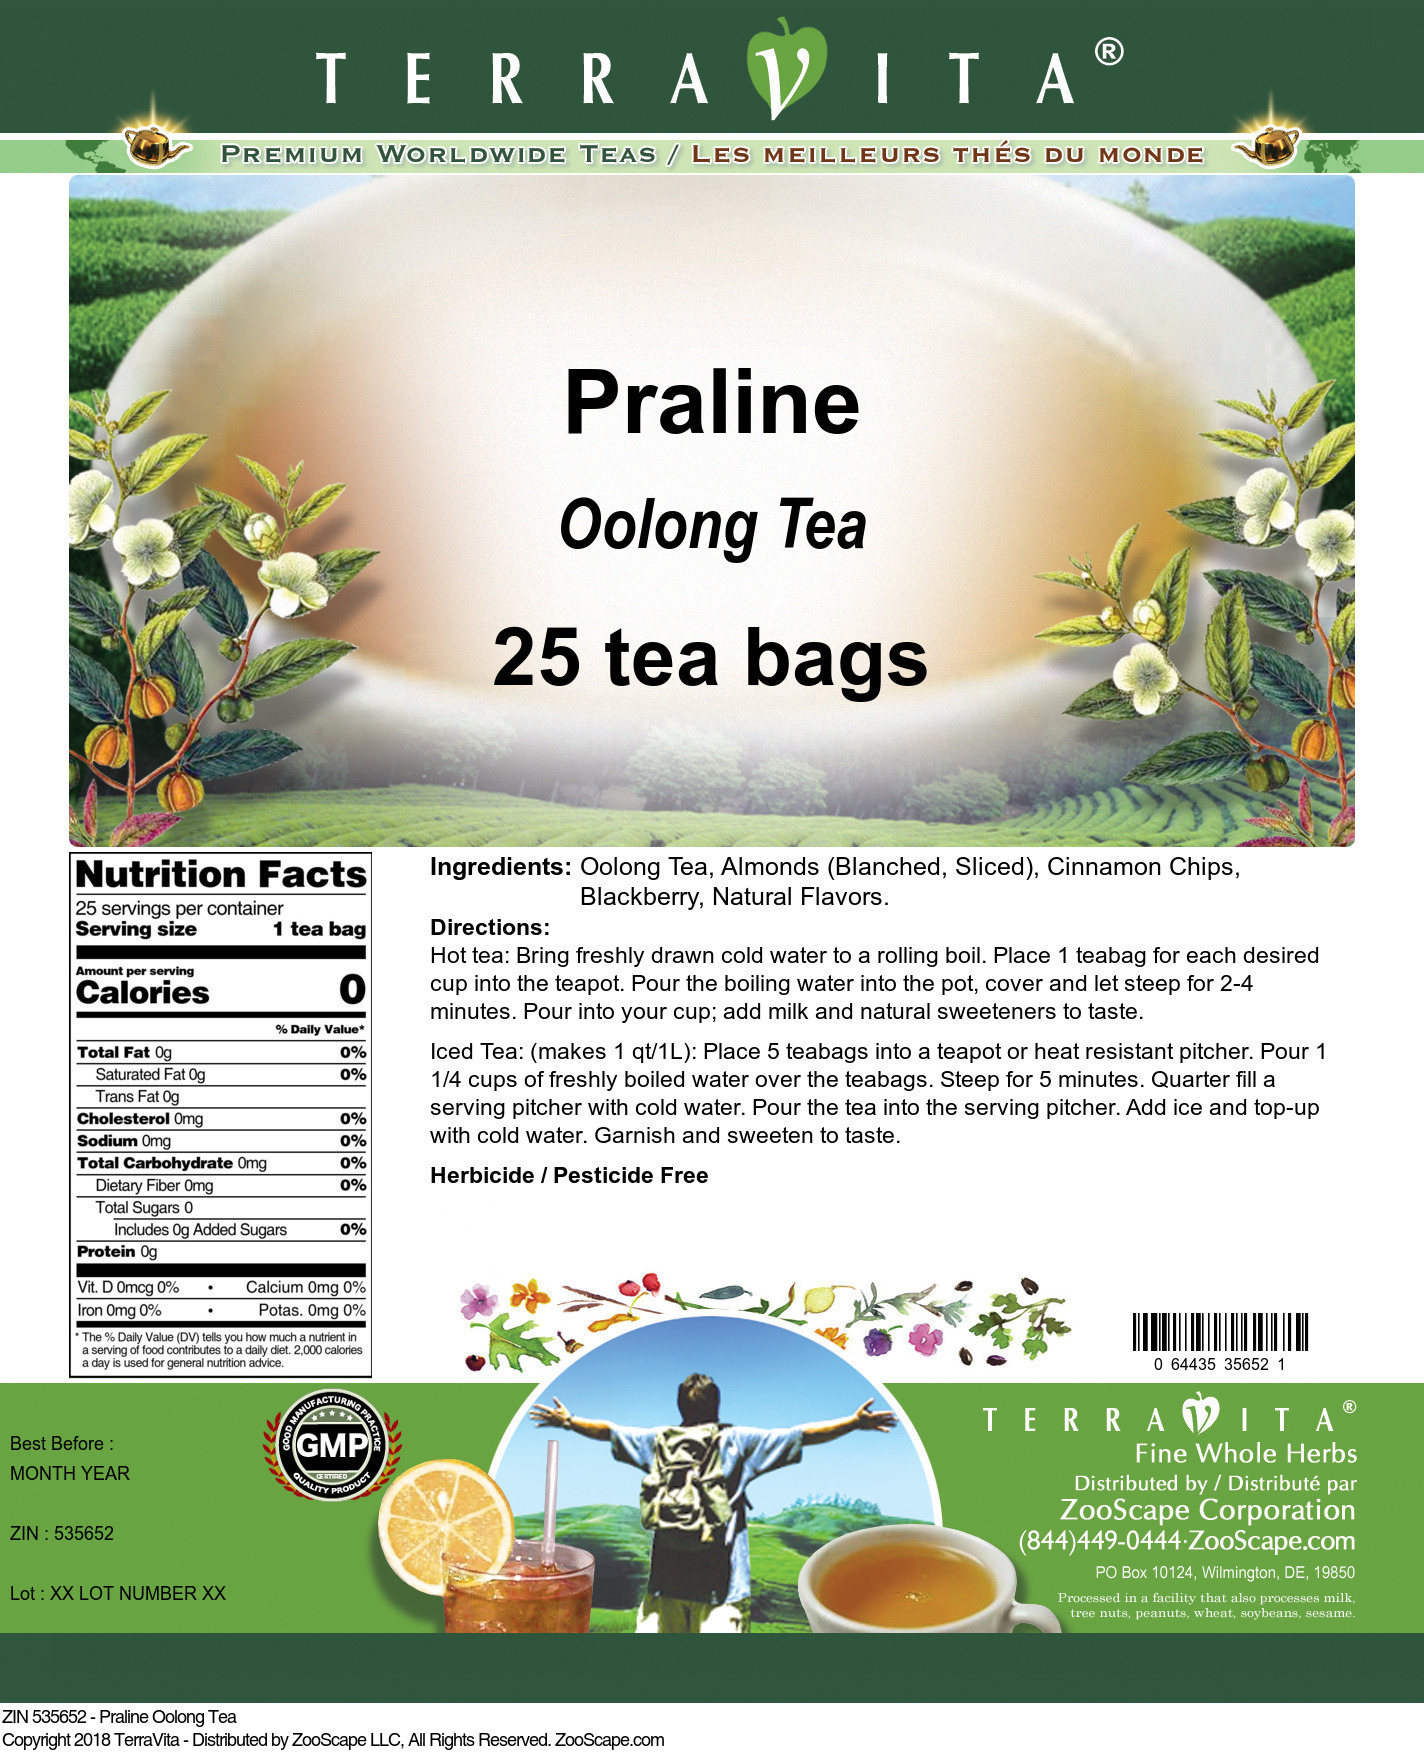 Praline Oolong Tea